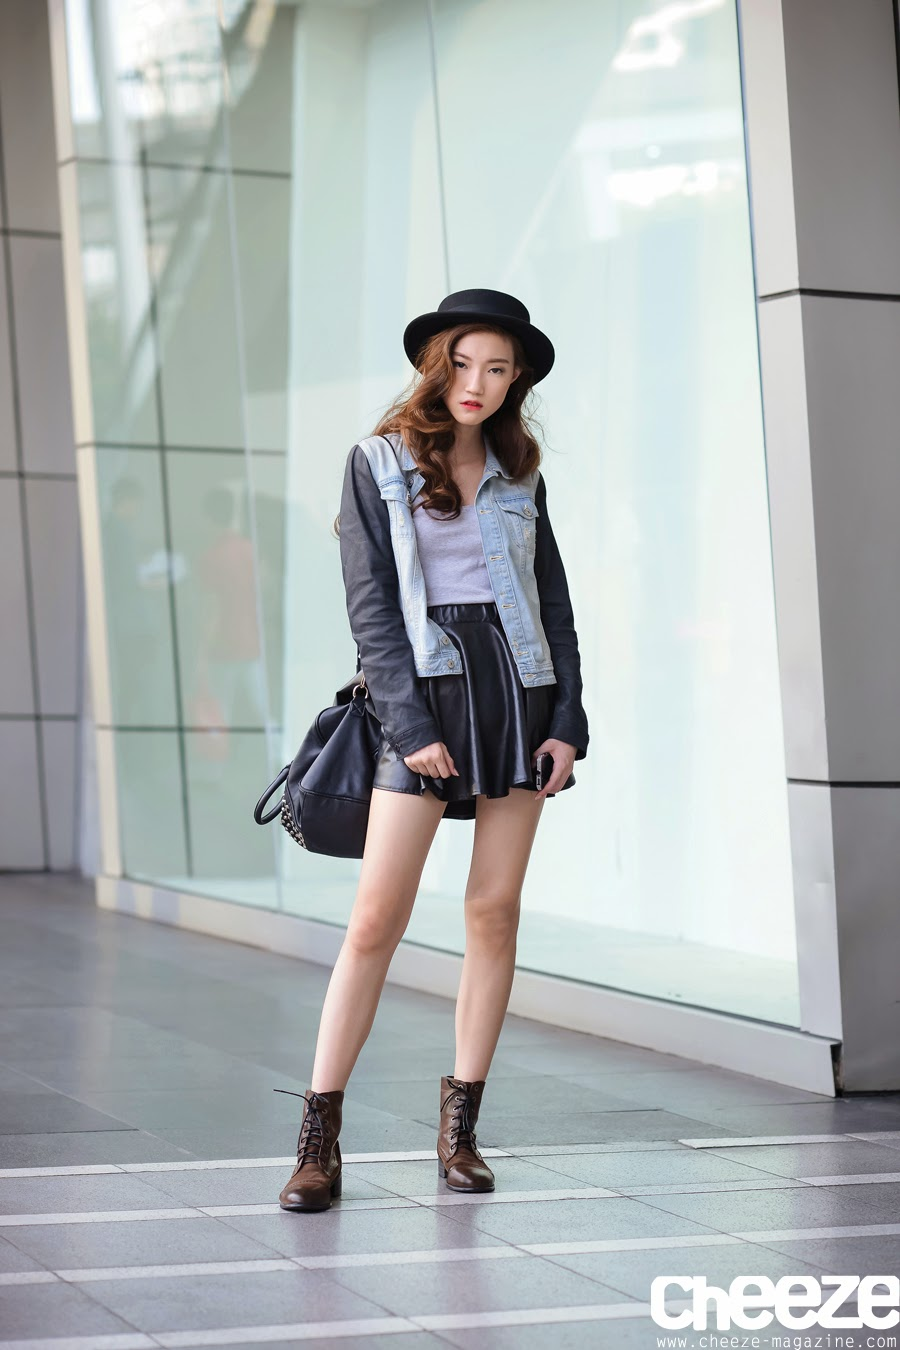 Bangkok Fashion Week: An Ordinary Girl: Bangkok Street Fashion (March, 2014